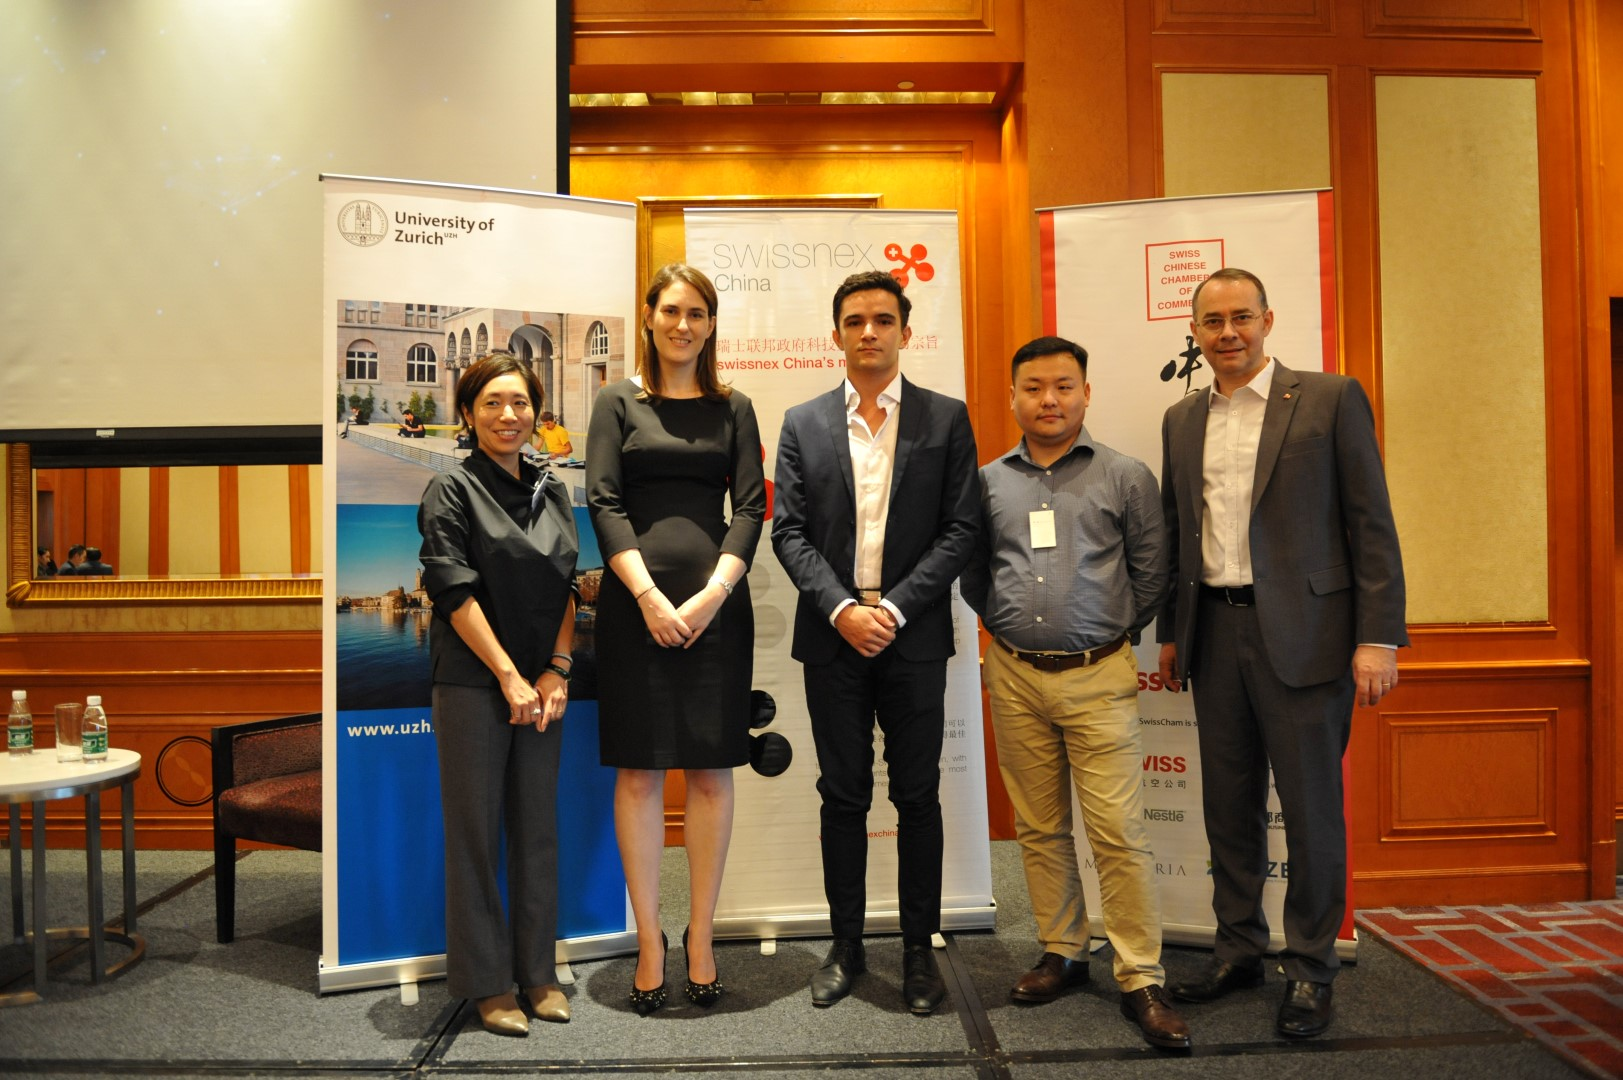 Makiko Aikawa & Gianna Abegg (Co-Presidents UZH Alumni Shanghai), Quentin Reyes, Dr. Wei Cheng and Felix Moesner